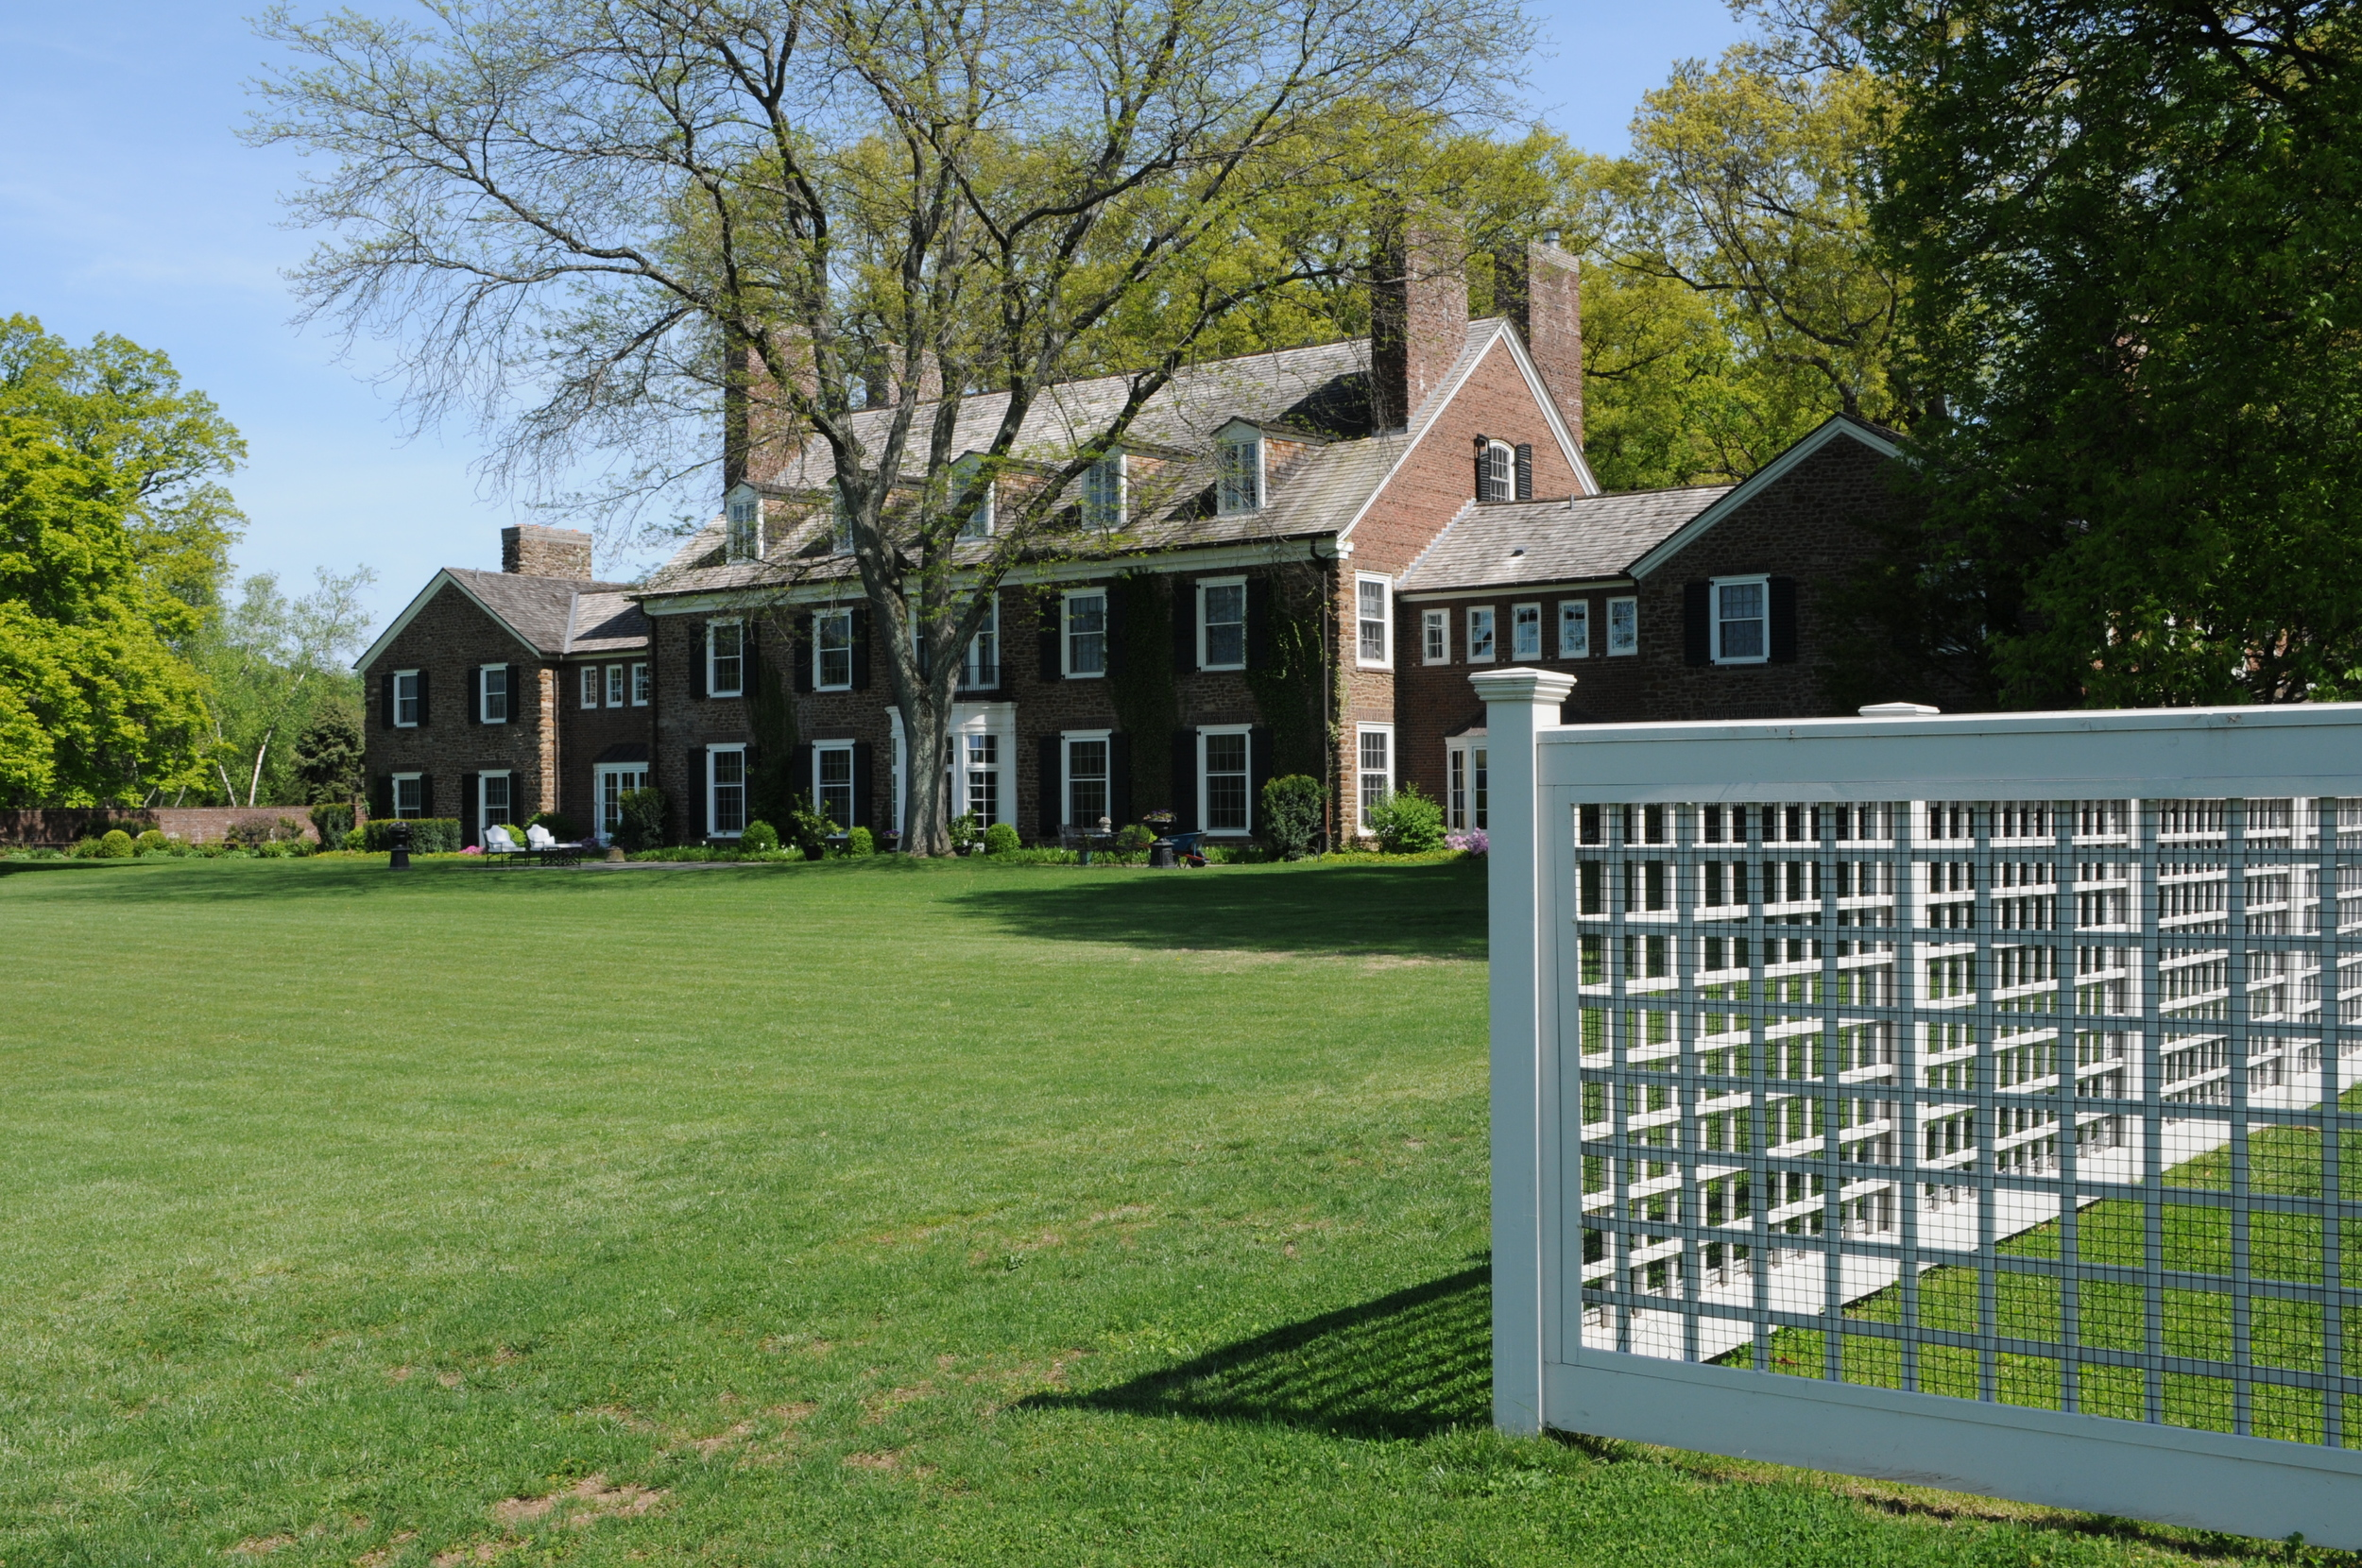 Redgate, Seth Thomas estate, New Vernon, New Jersey